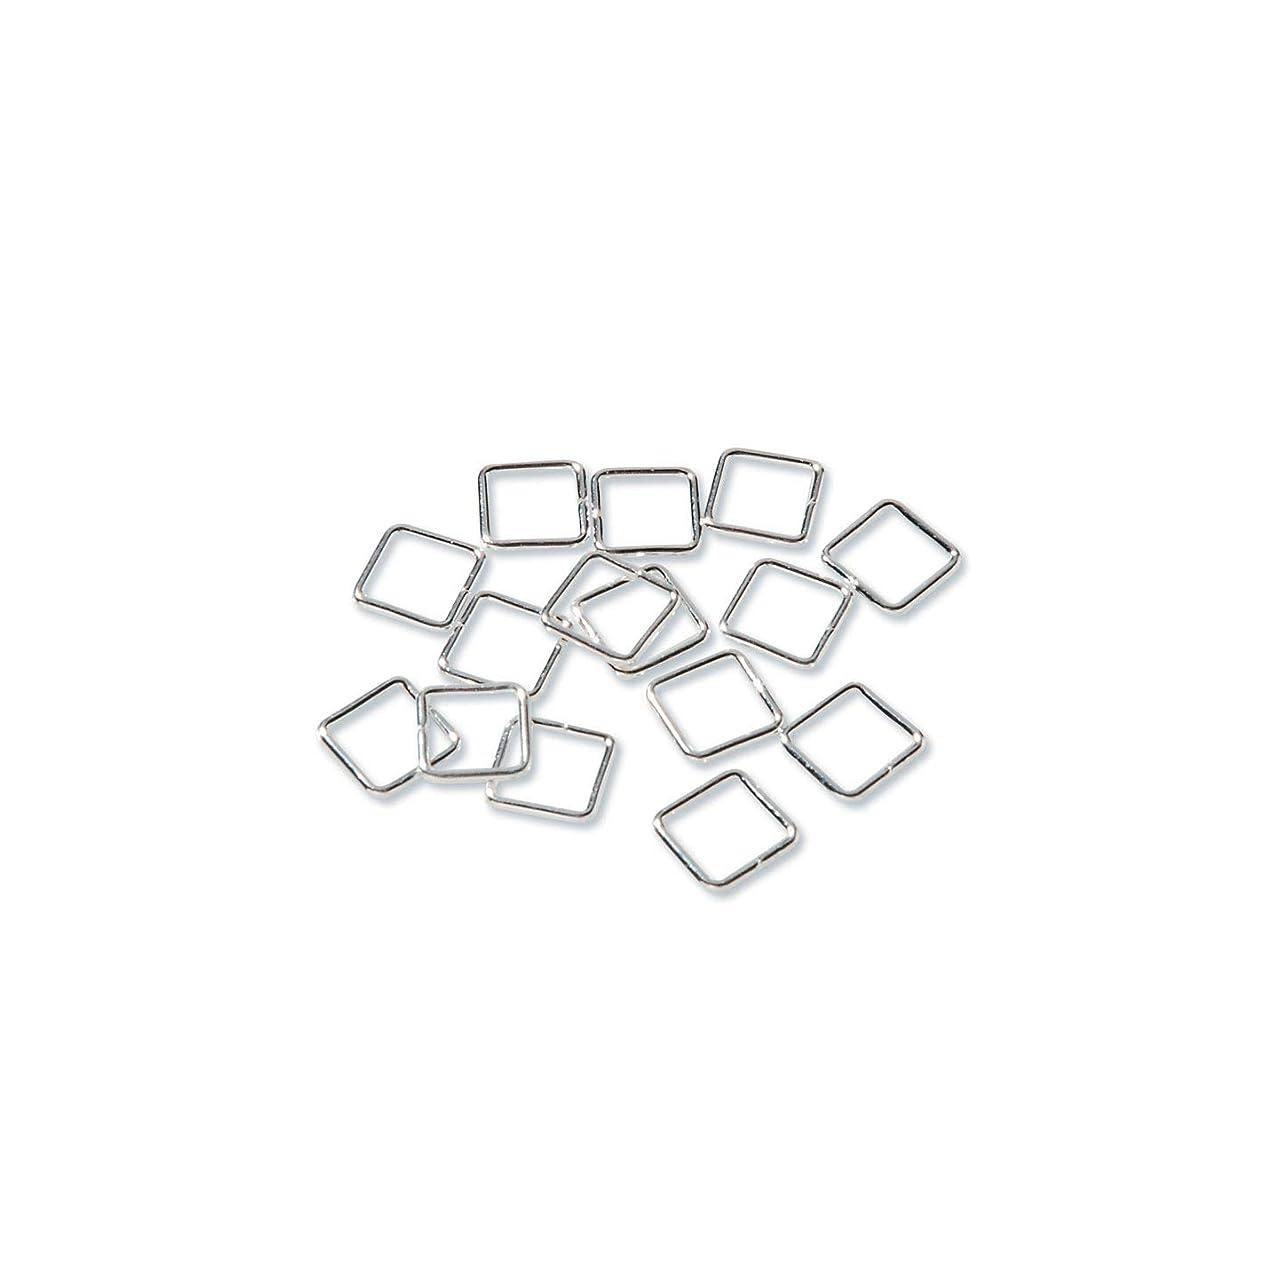 Bulk Buy: Darice DIY Crafts Jump Rings Square Sterling Silver Plated 7mm (6-Pack) 1996-11